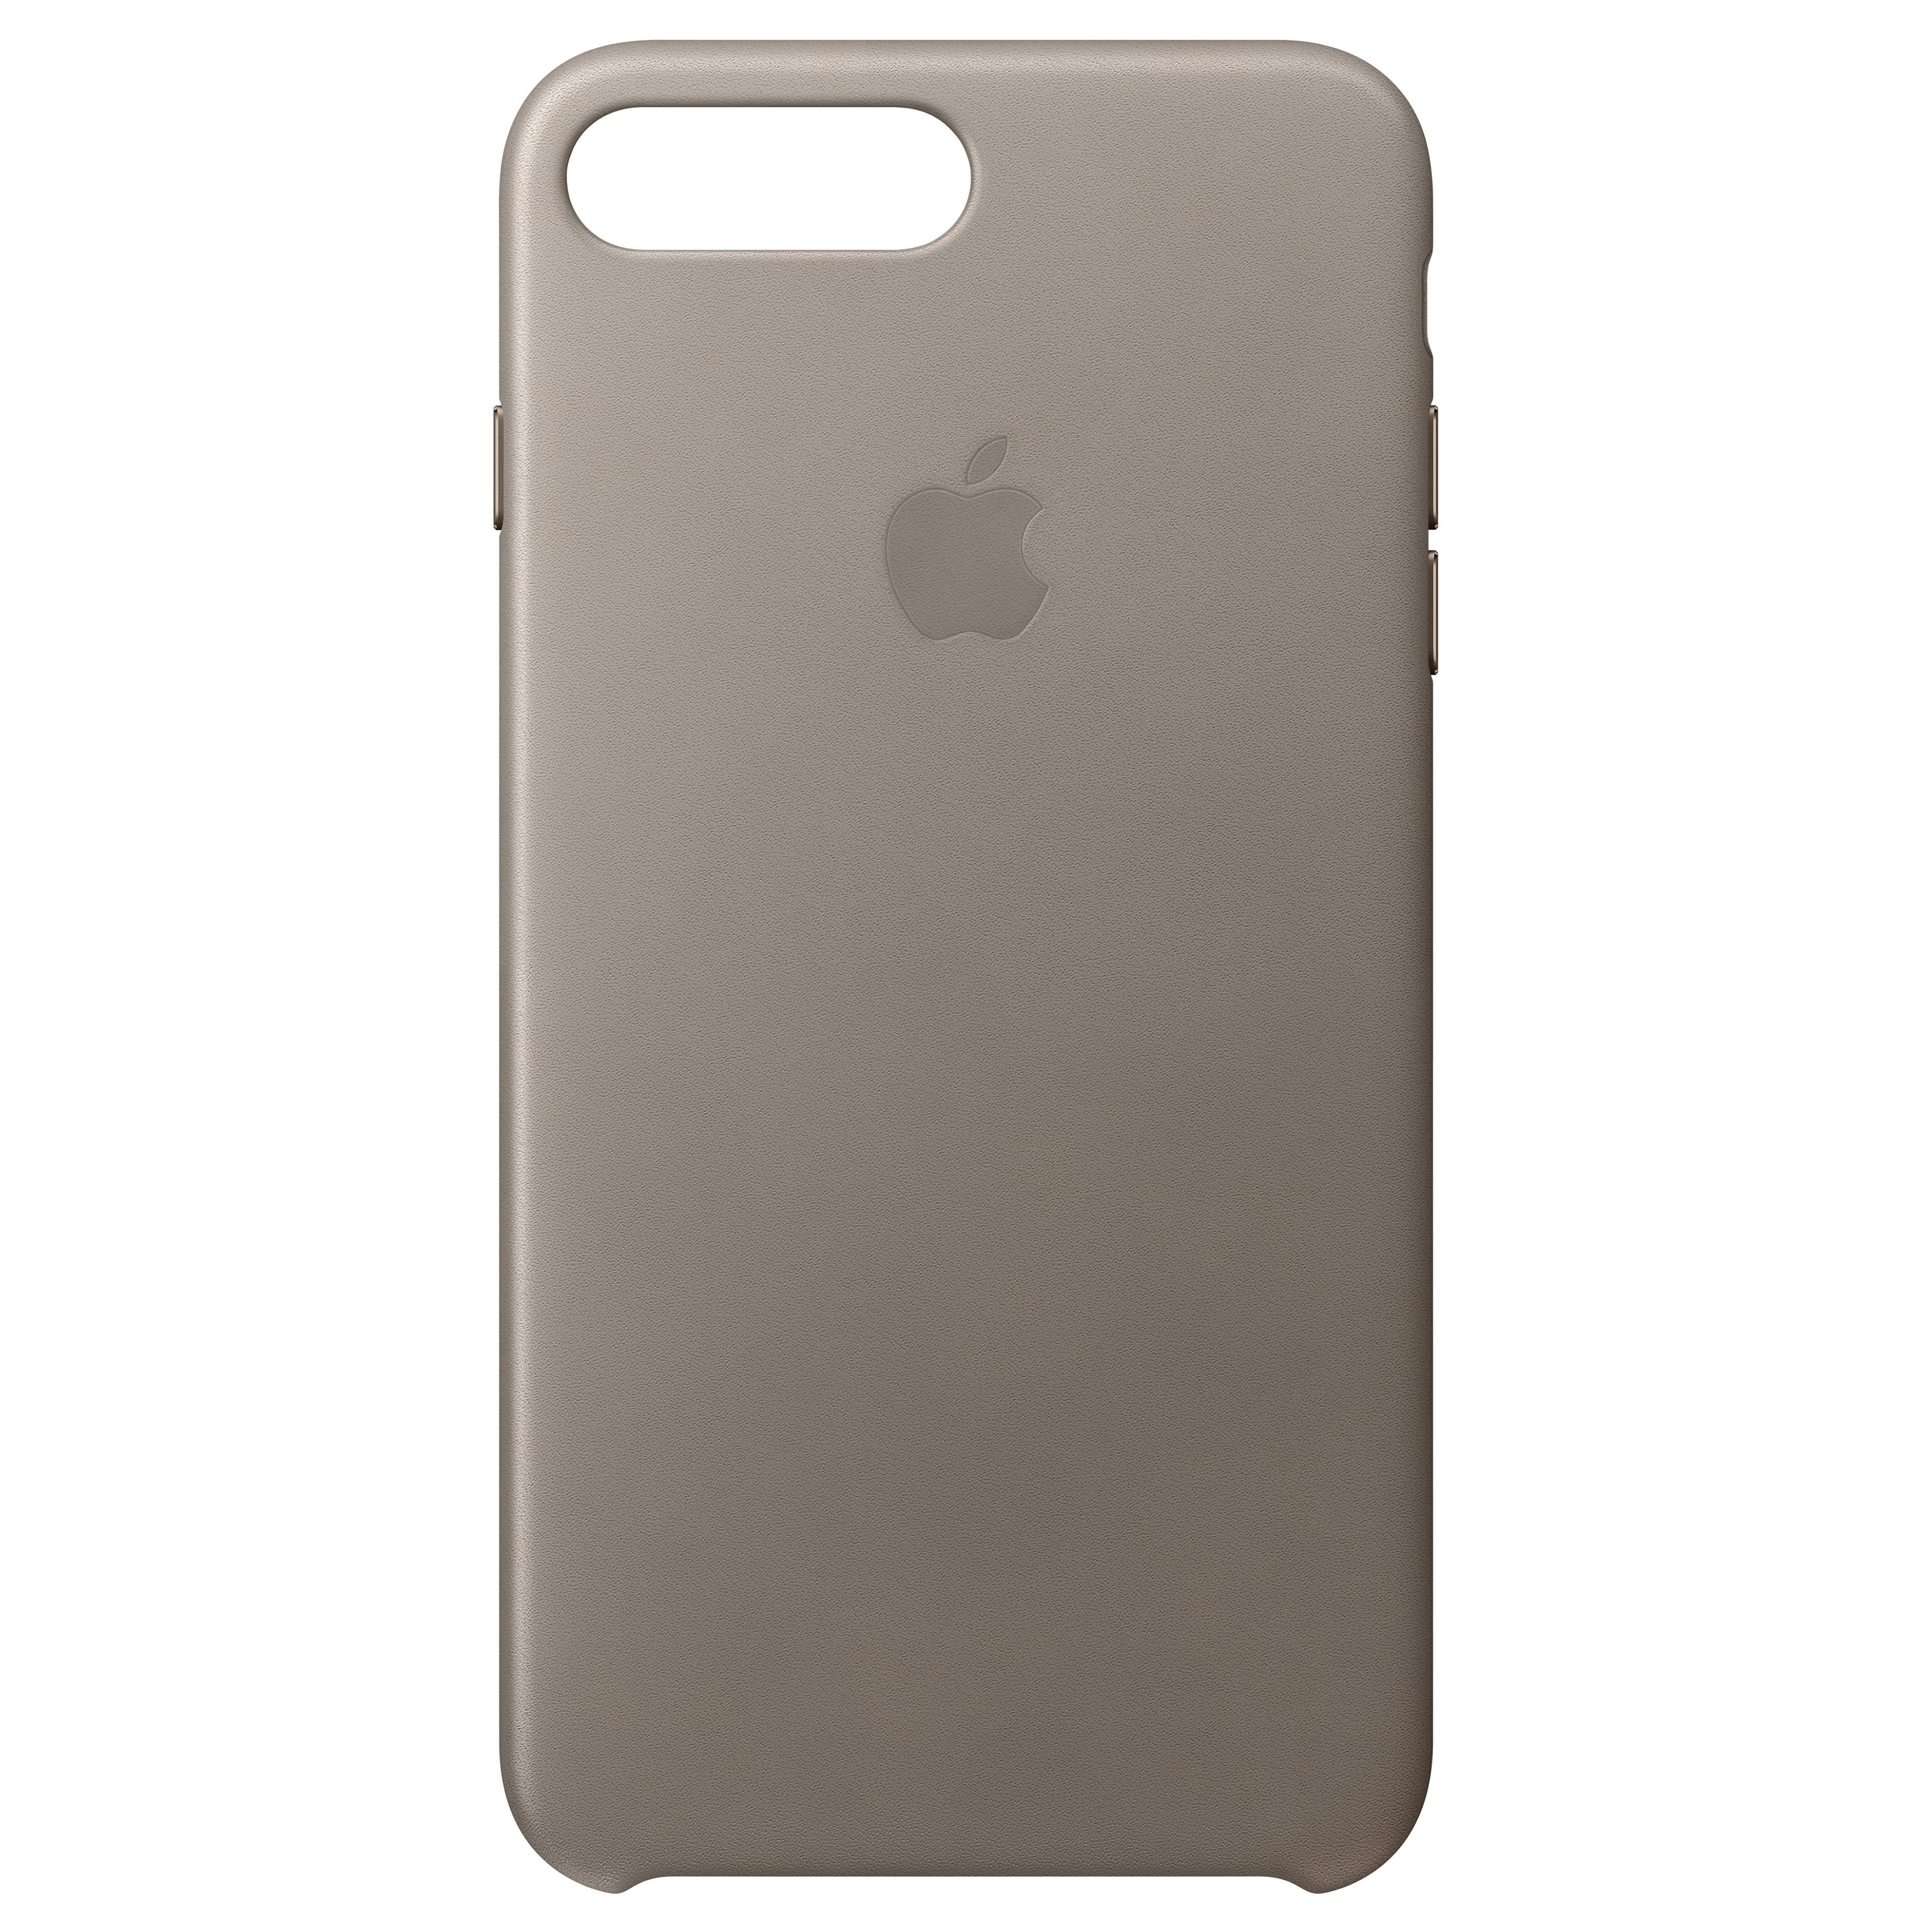 MQHJ2ZM/A : iPhone 8 Plus skinndeksel (taupe)